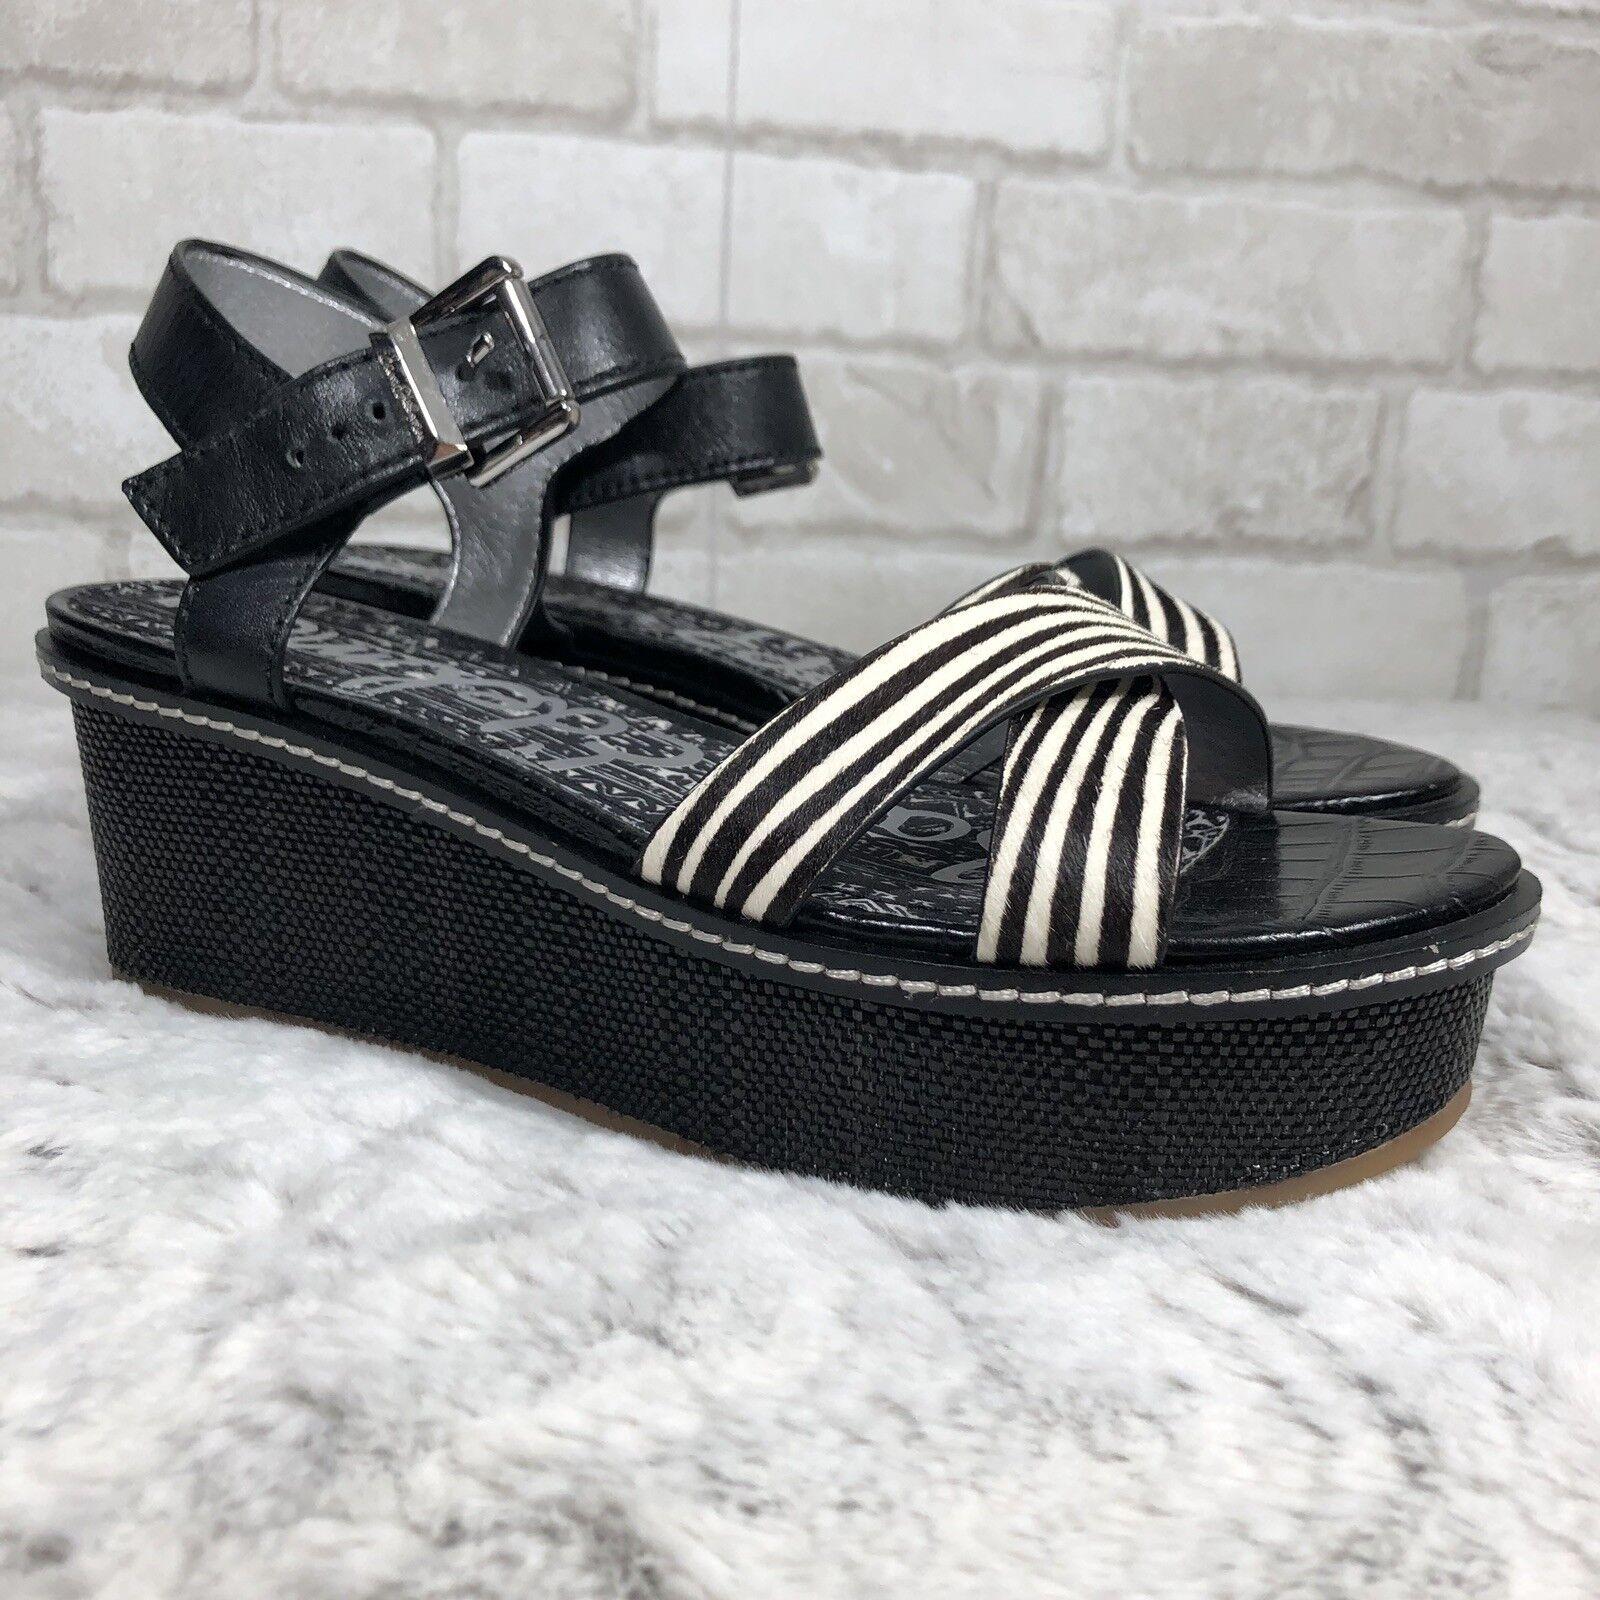 NWOB Sam Edelman Zebra Print Calf Fur Ankle Strap Platform Wedges Dimensione 9M ( K13)